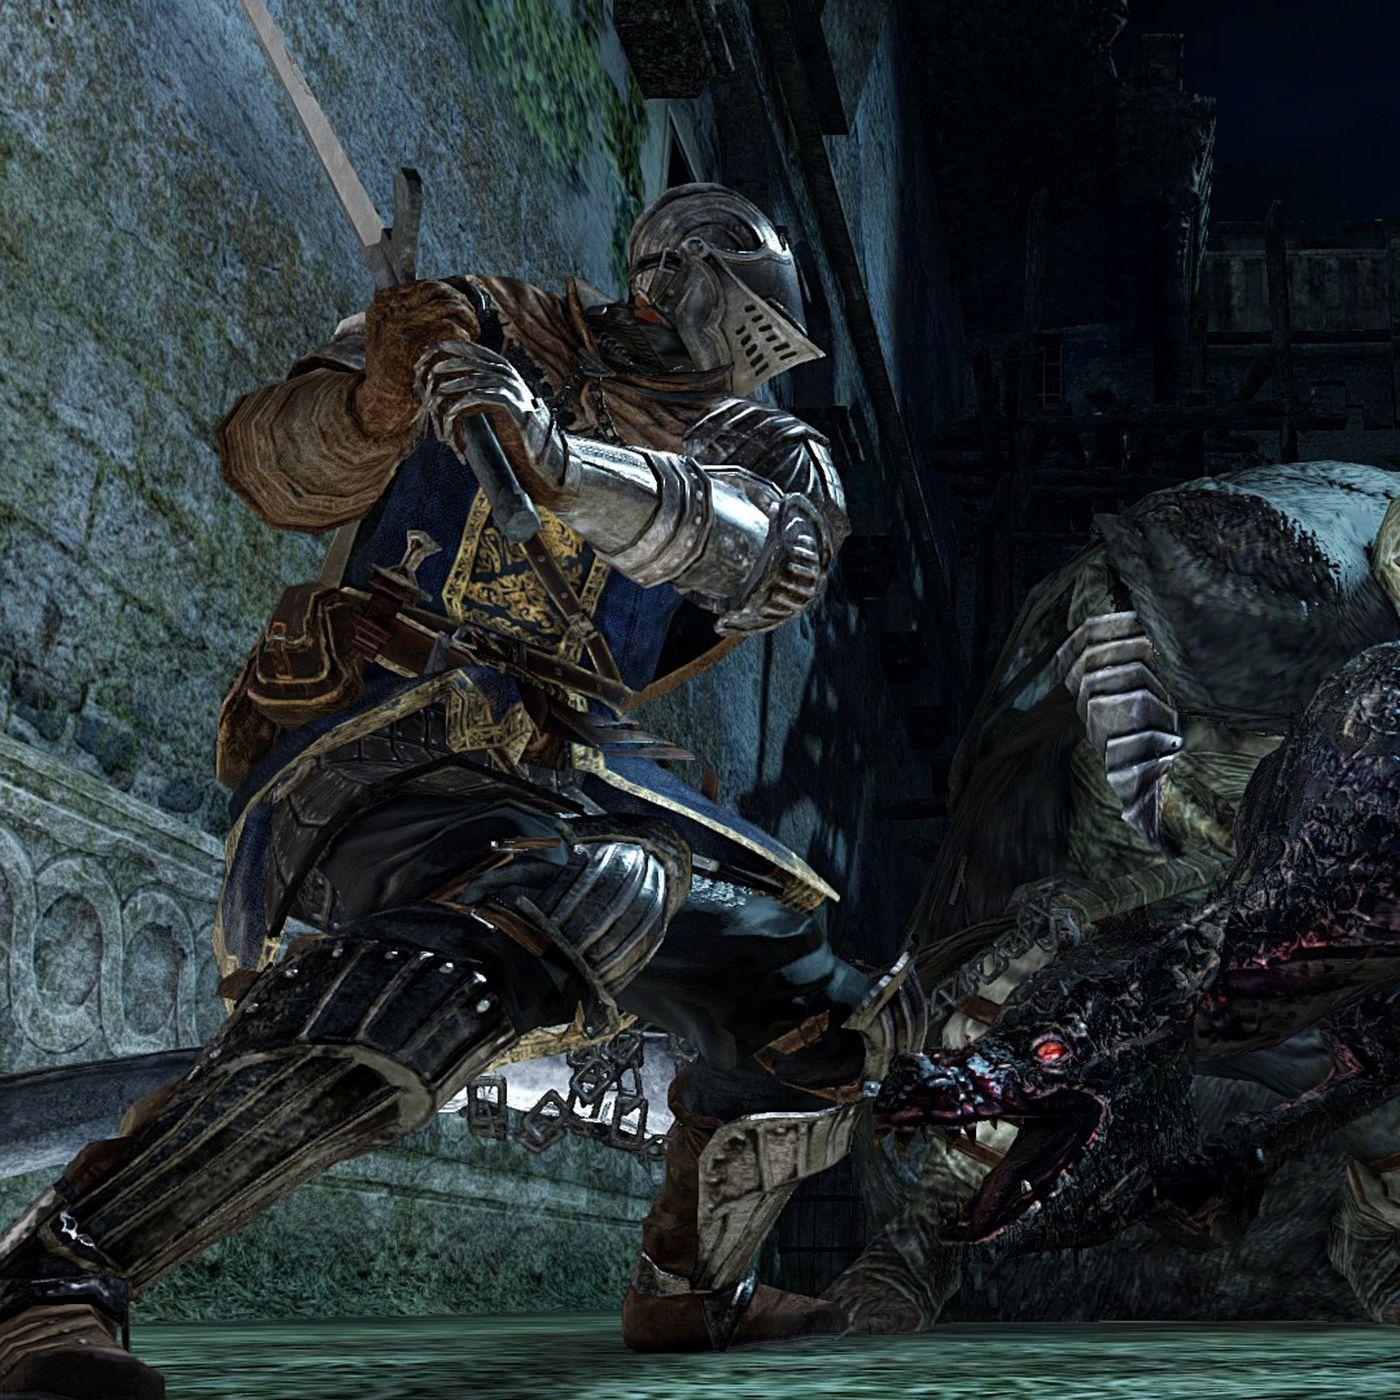 dark souls 3 weapon based matchmaking war thunder battle rating matchmaking